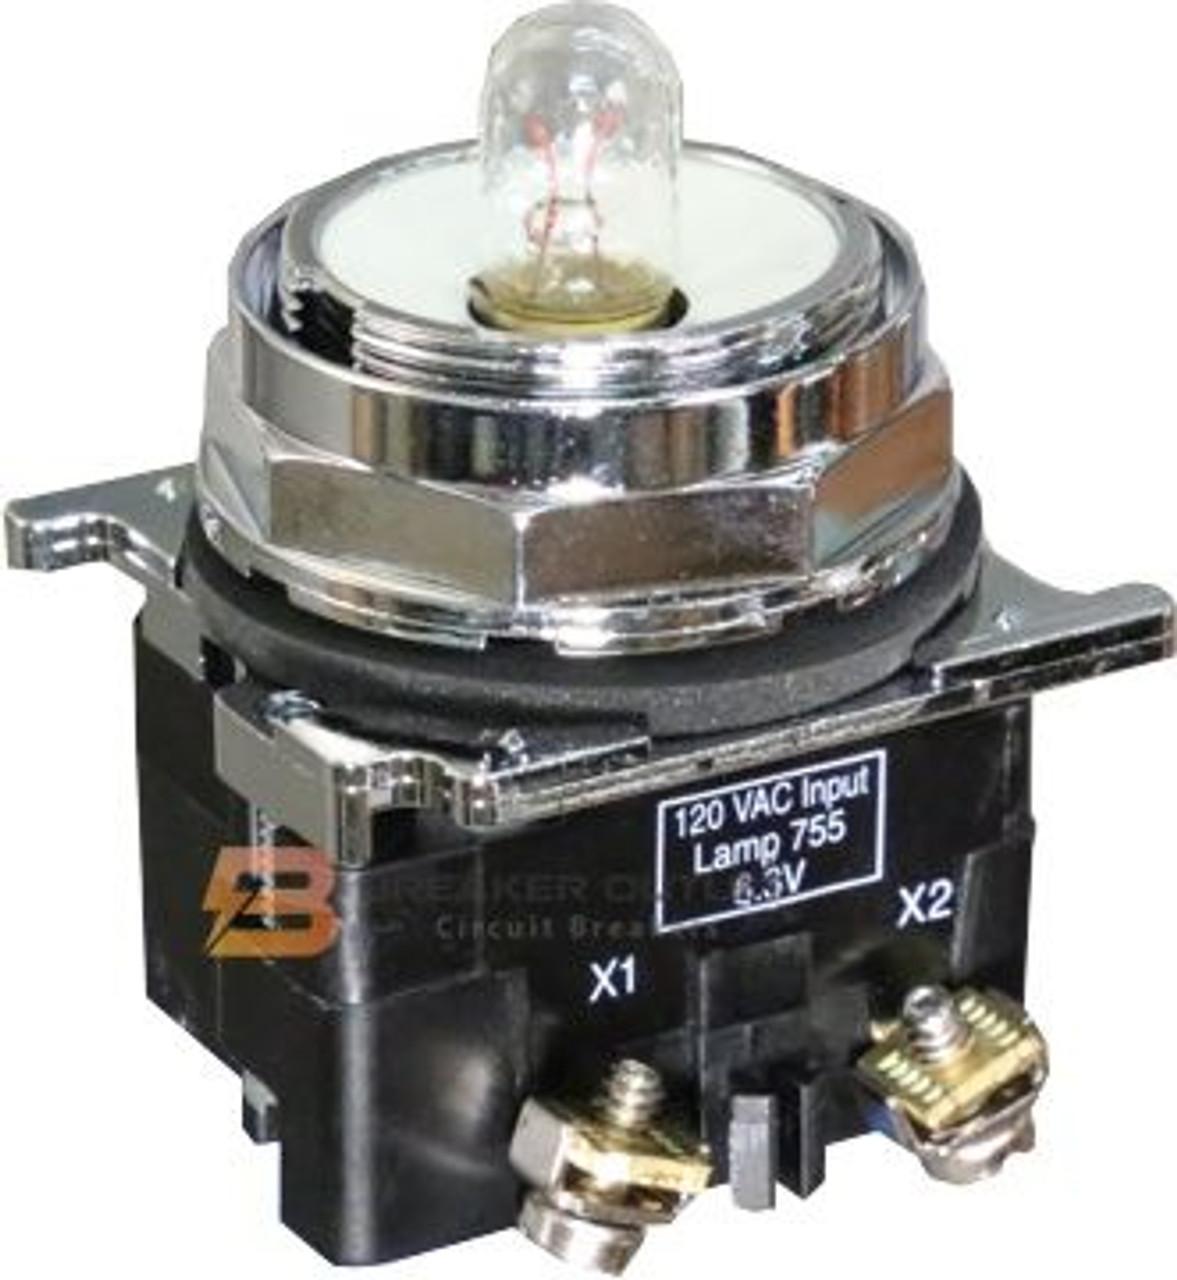 10250T181N 10250T181N Indicating Light / Pilot Light